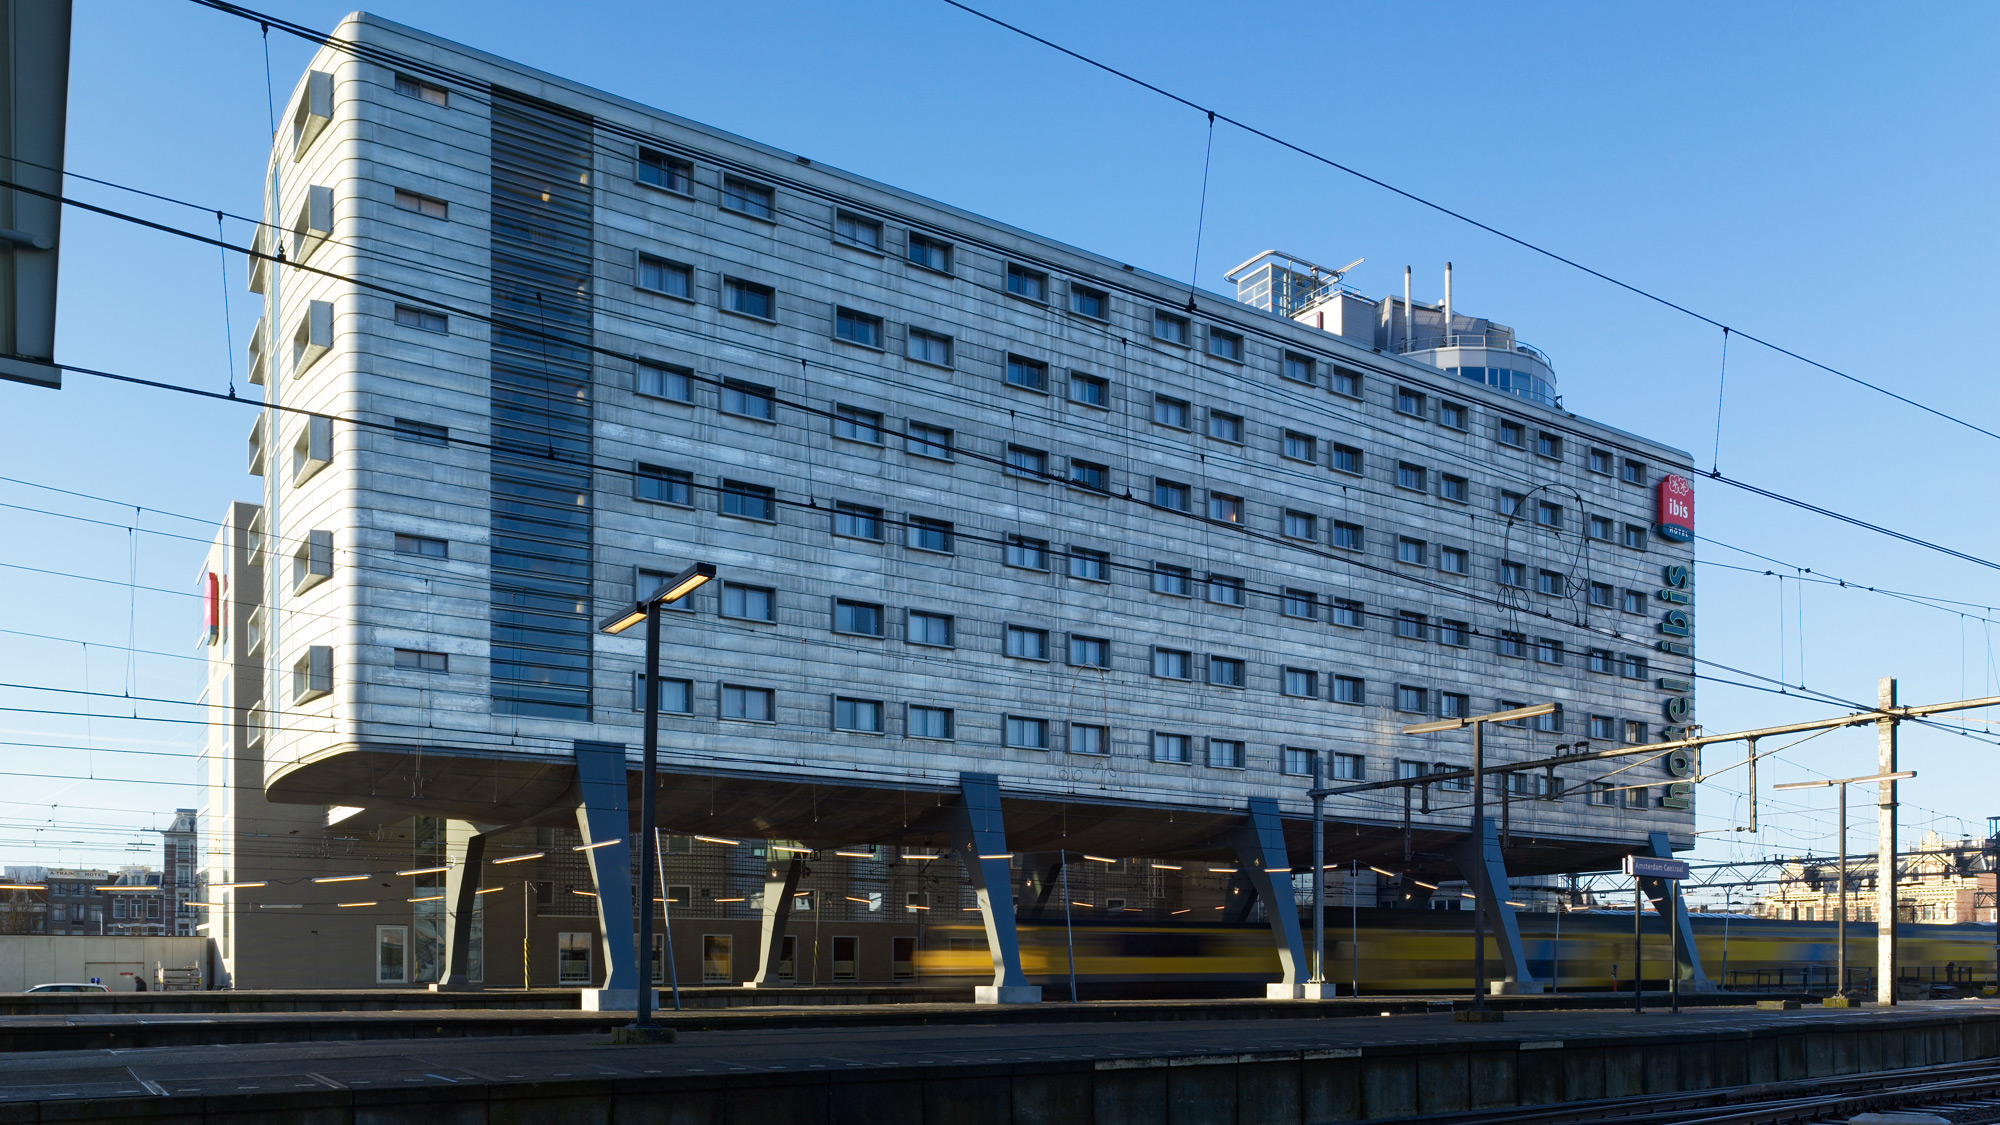 Hotel ibis amsterdam centre ruland architecten for Ibis hotel amsterdam